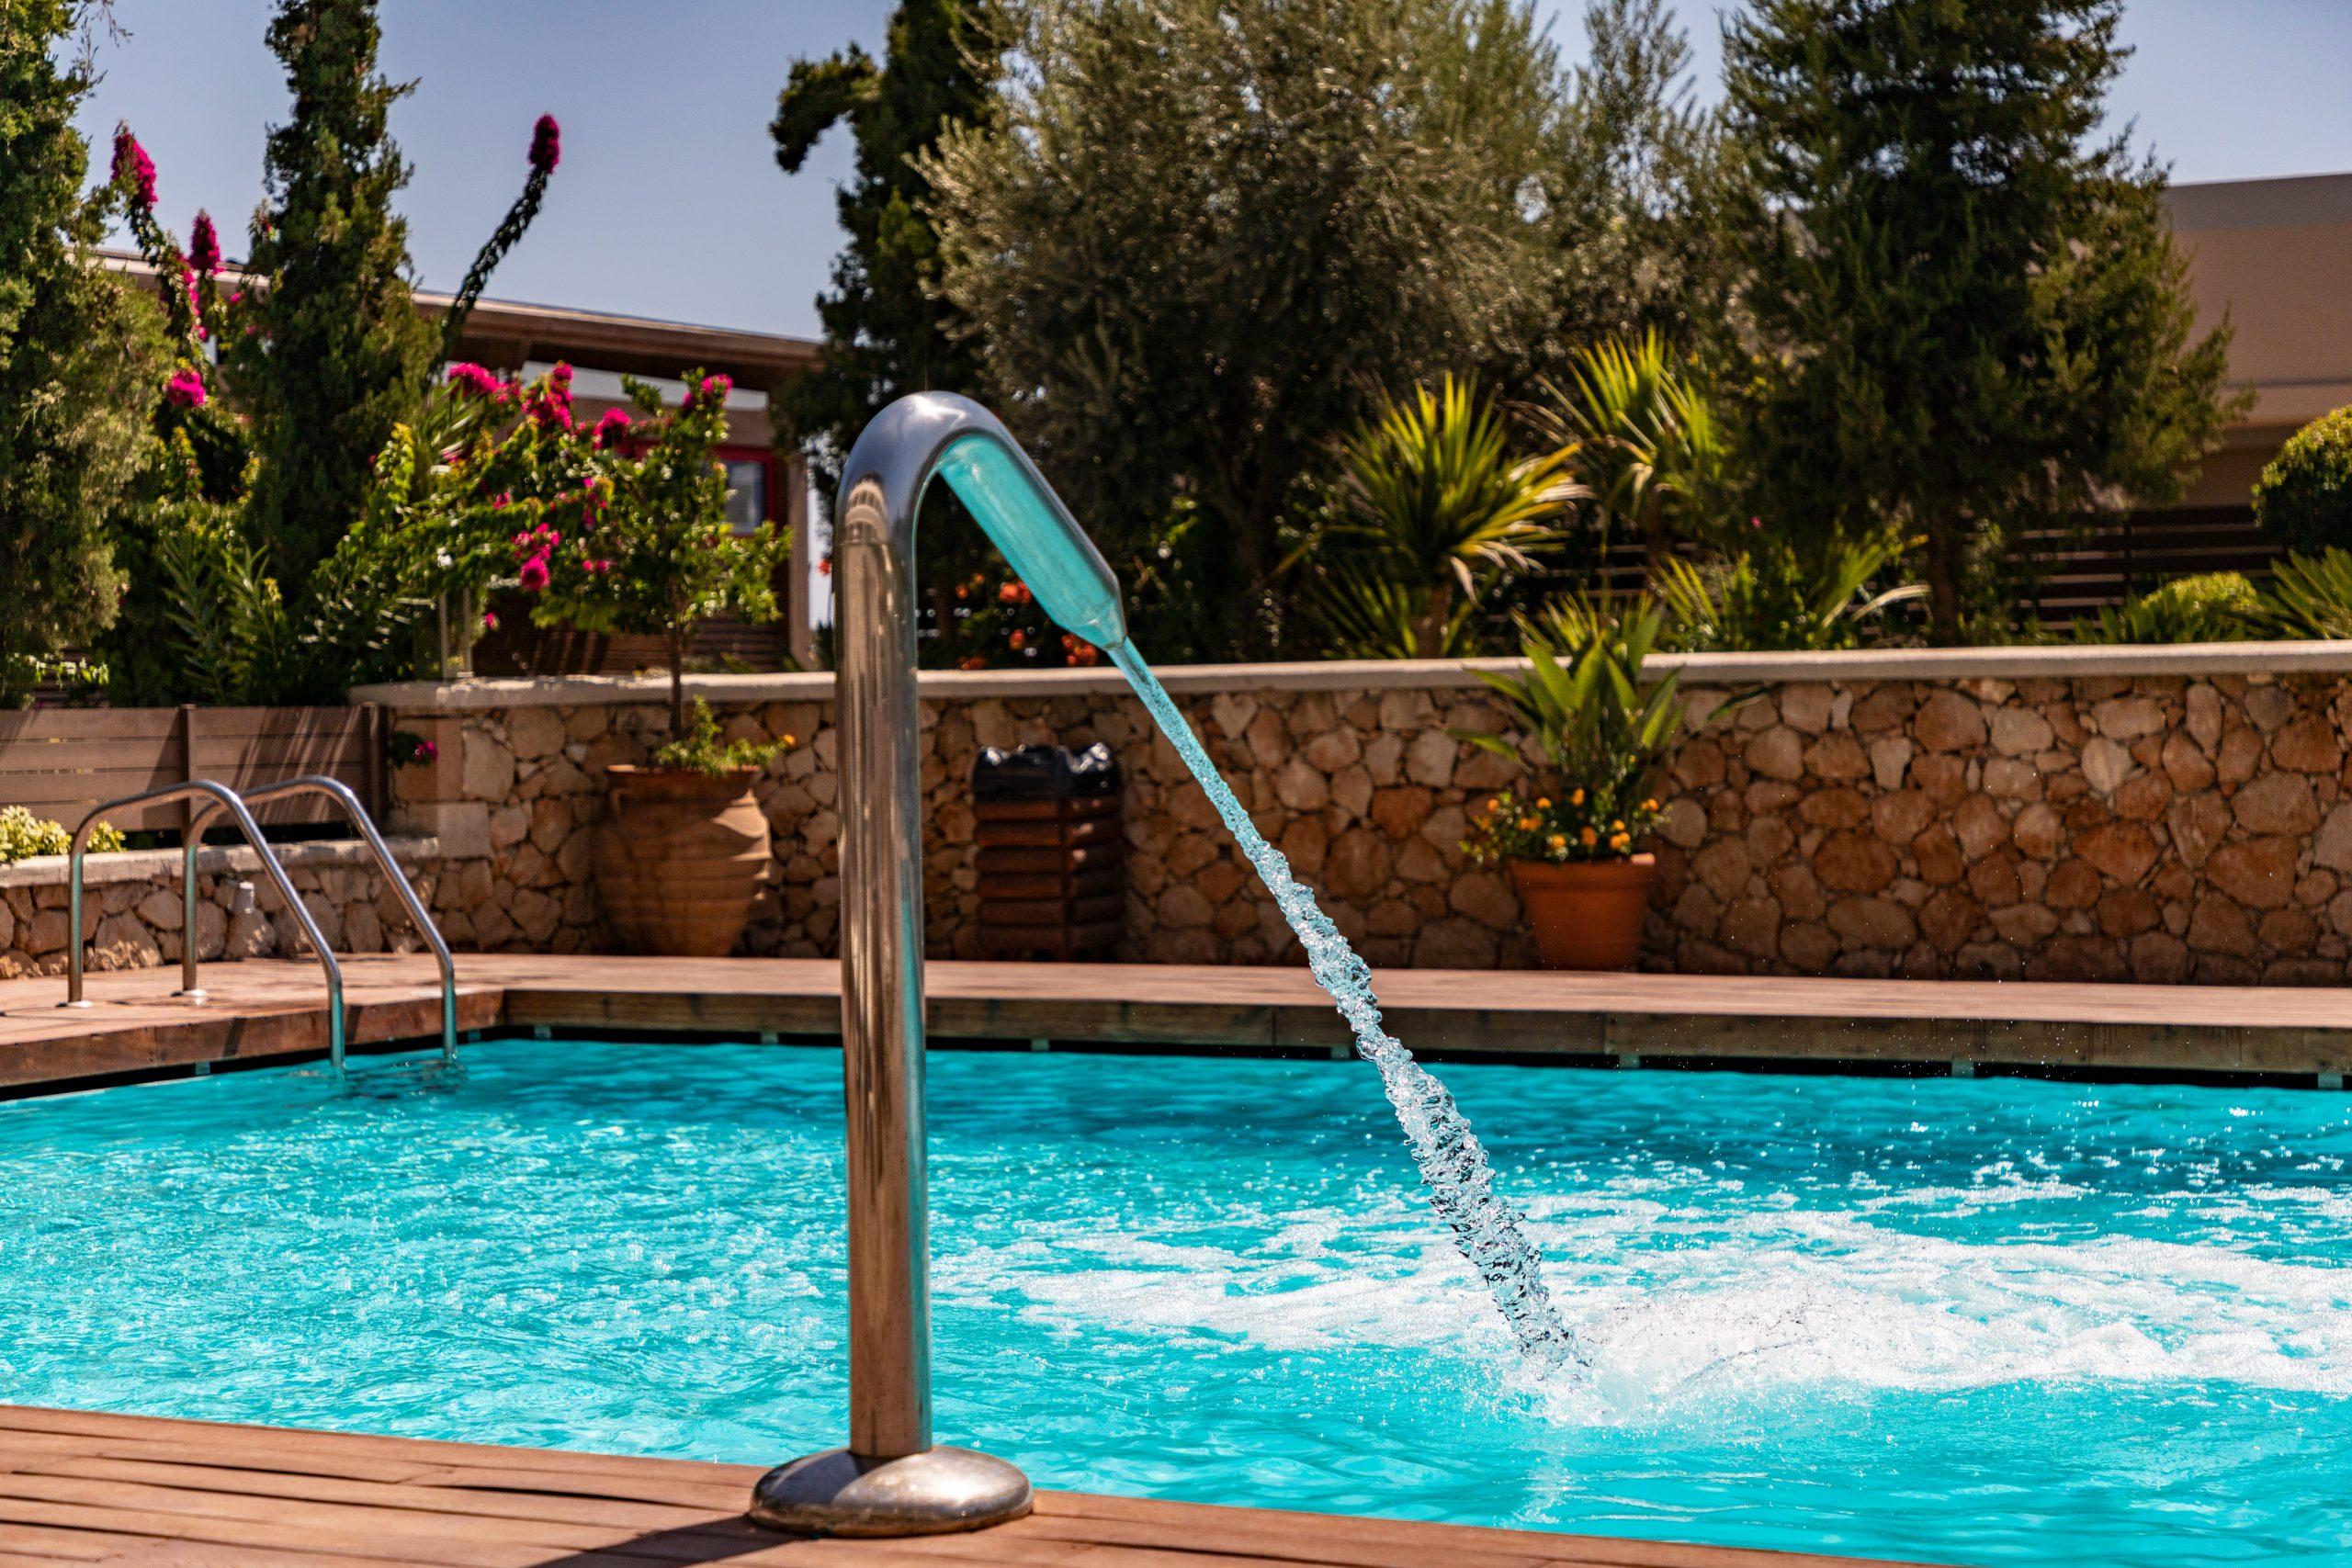 Quel abri de piscine choisir ? 1